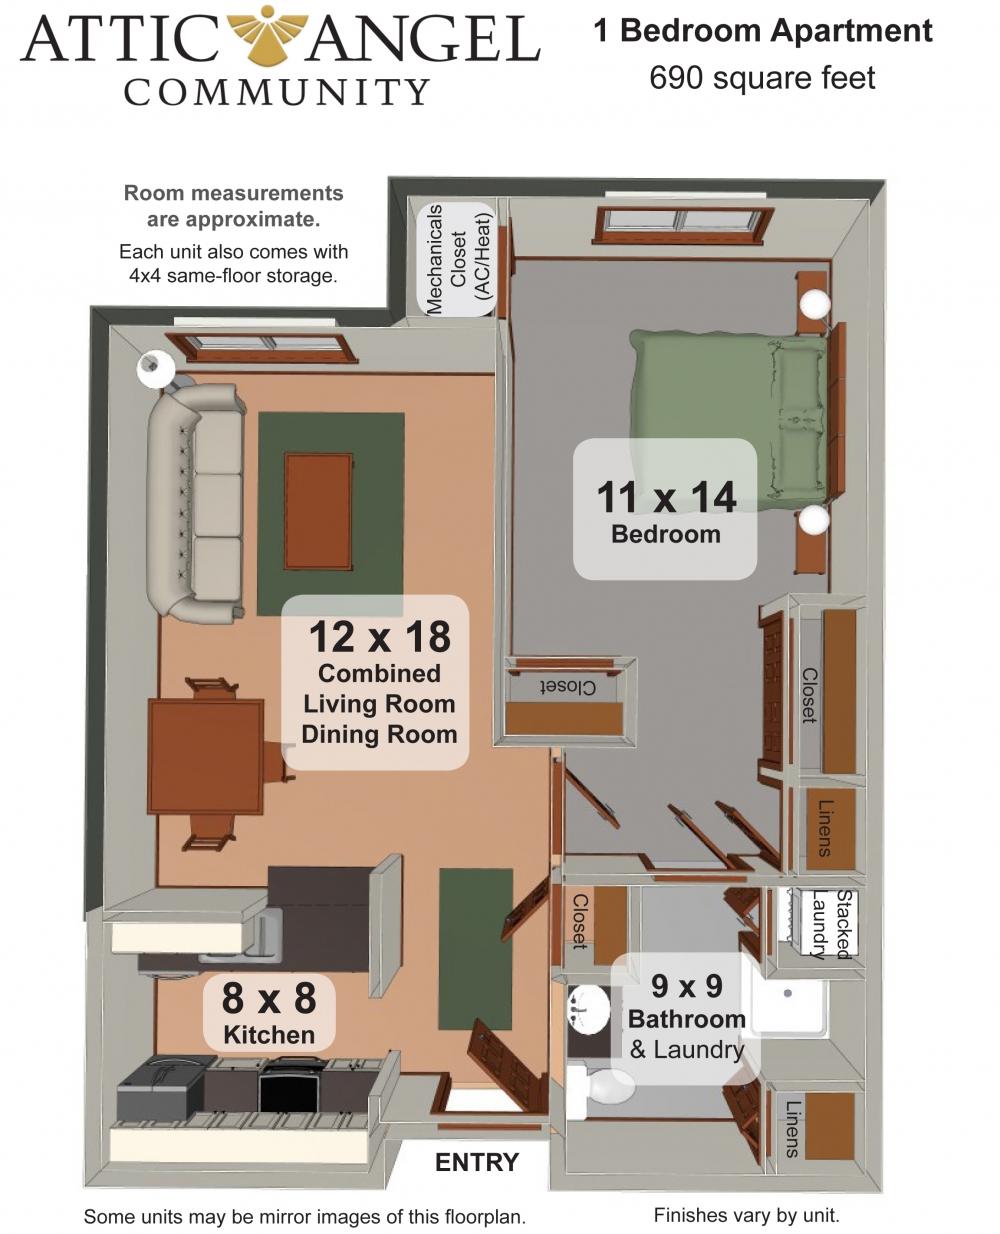 One Bedroom Apartment - Attic Angel Community